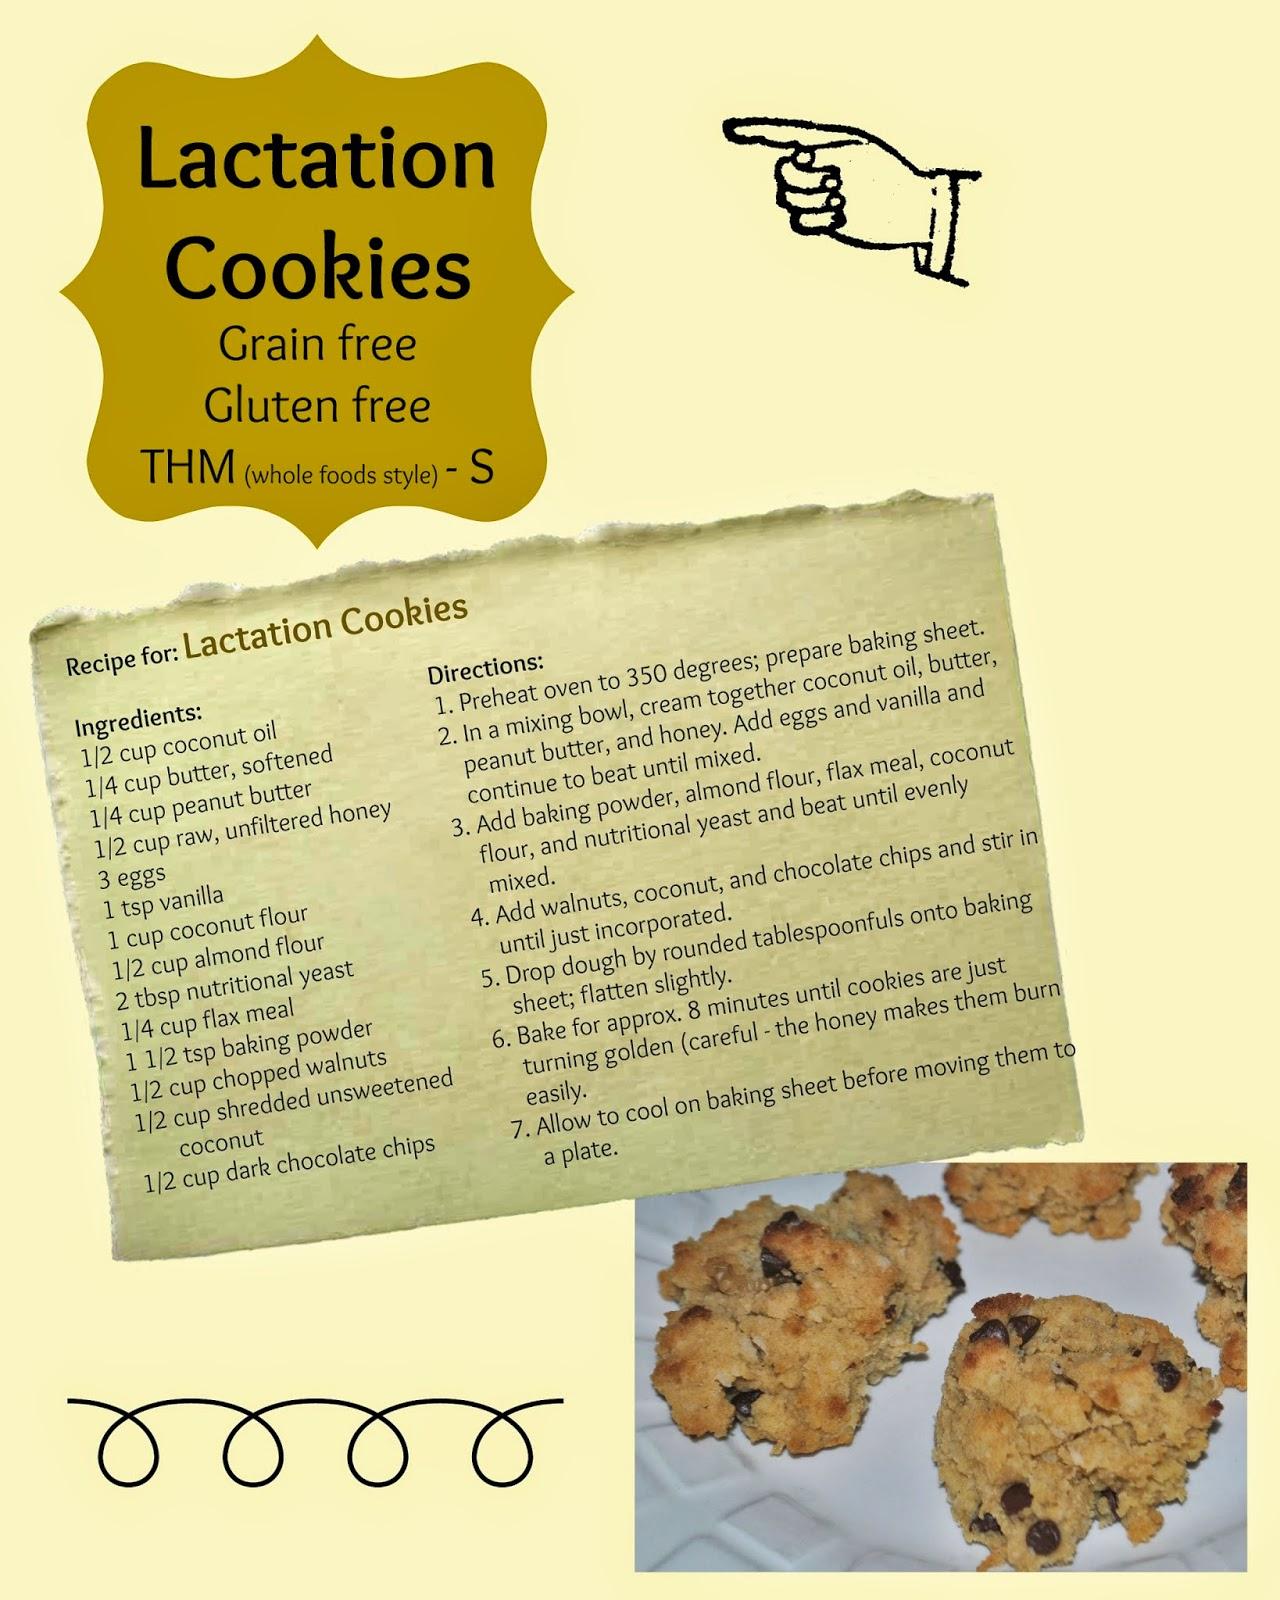 Lactation Cookies Whole Foods